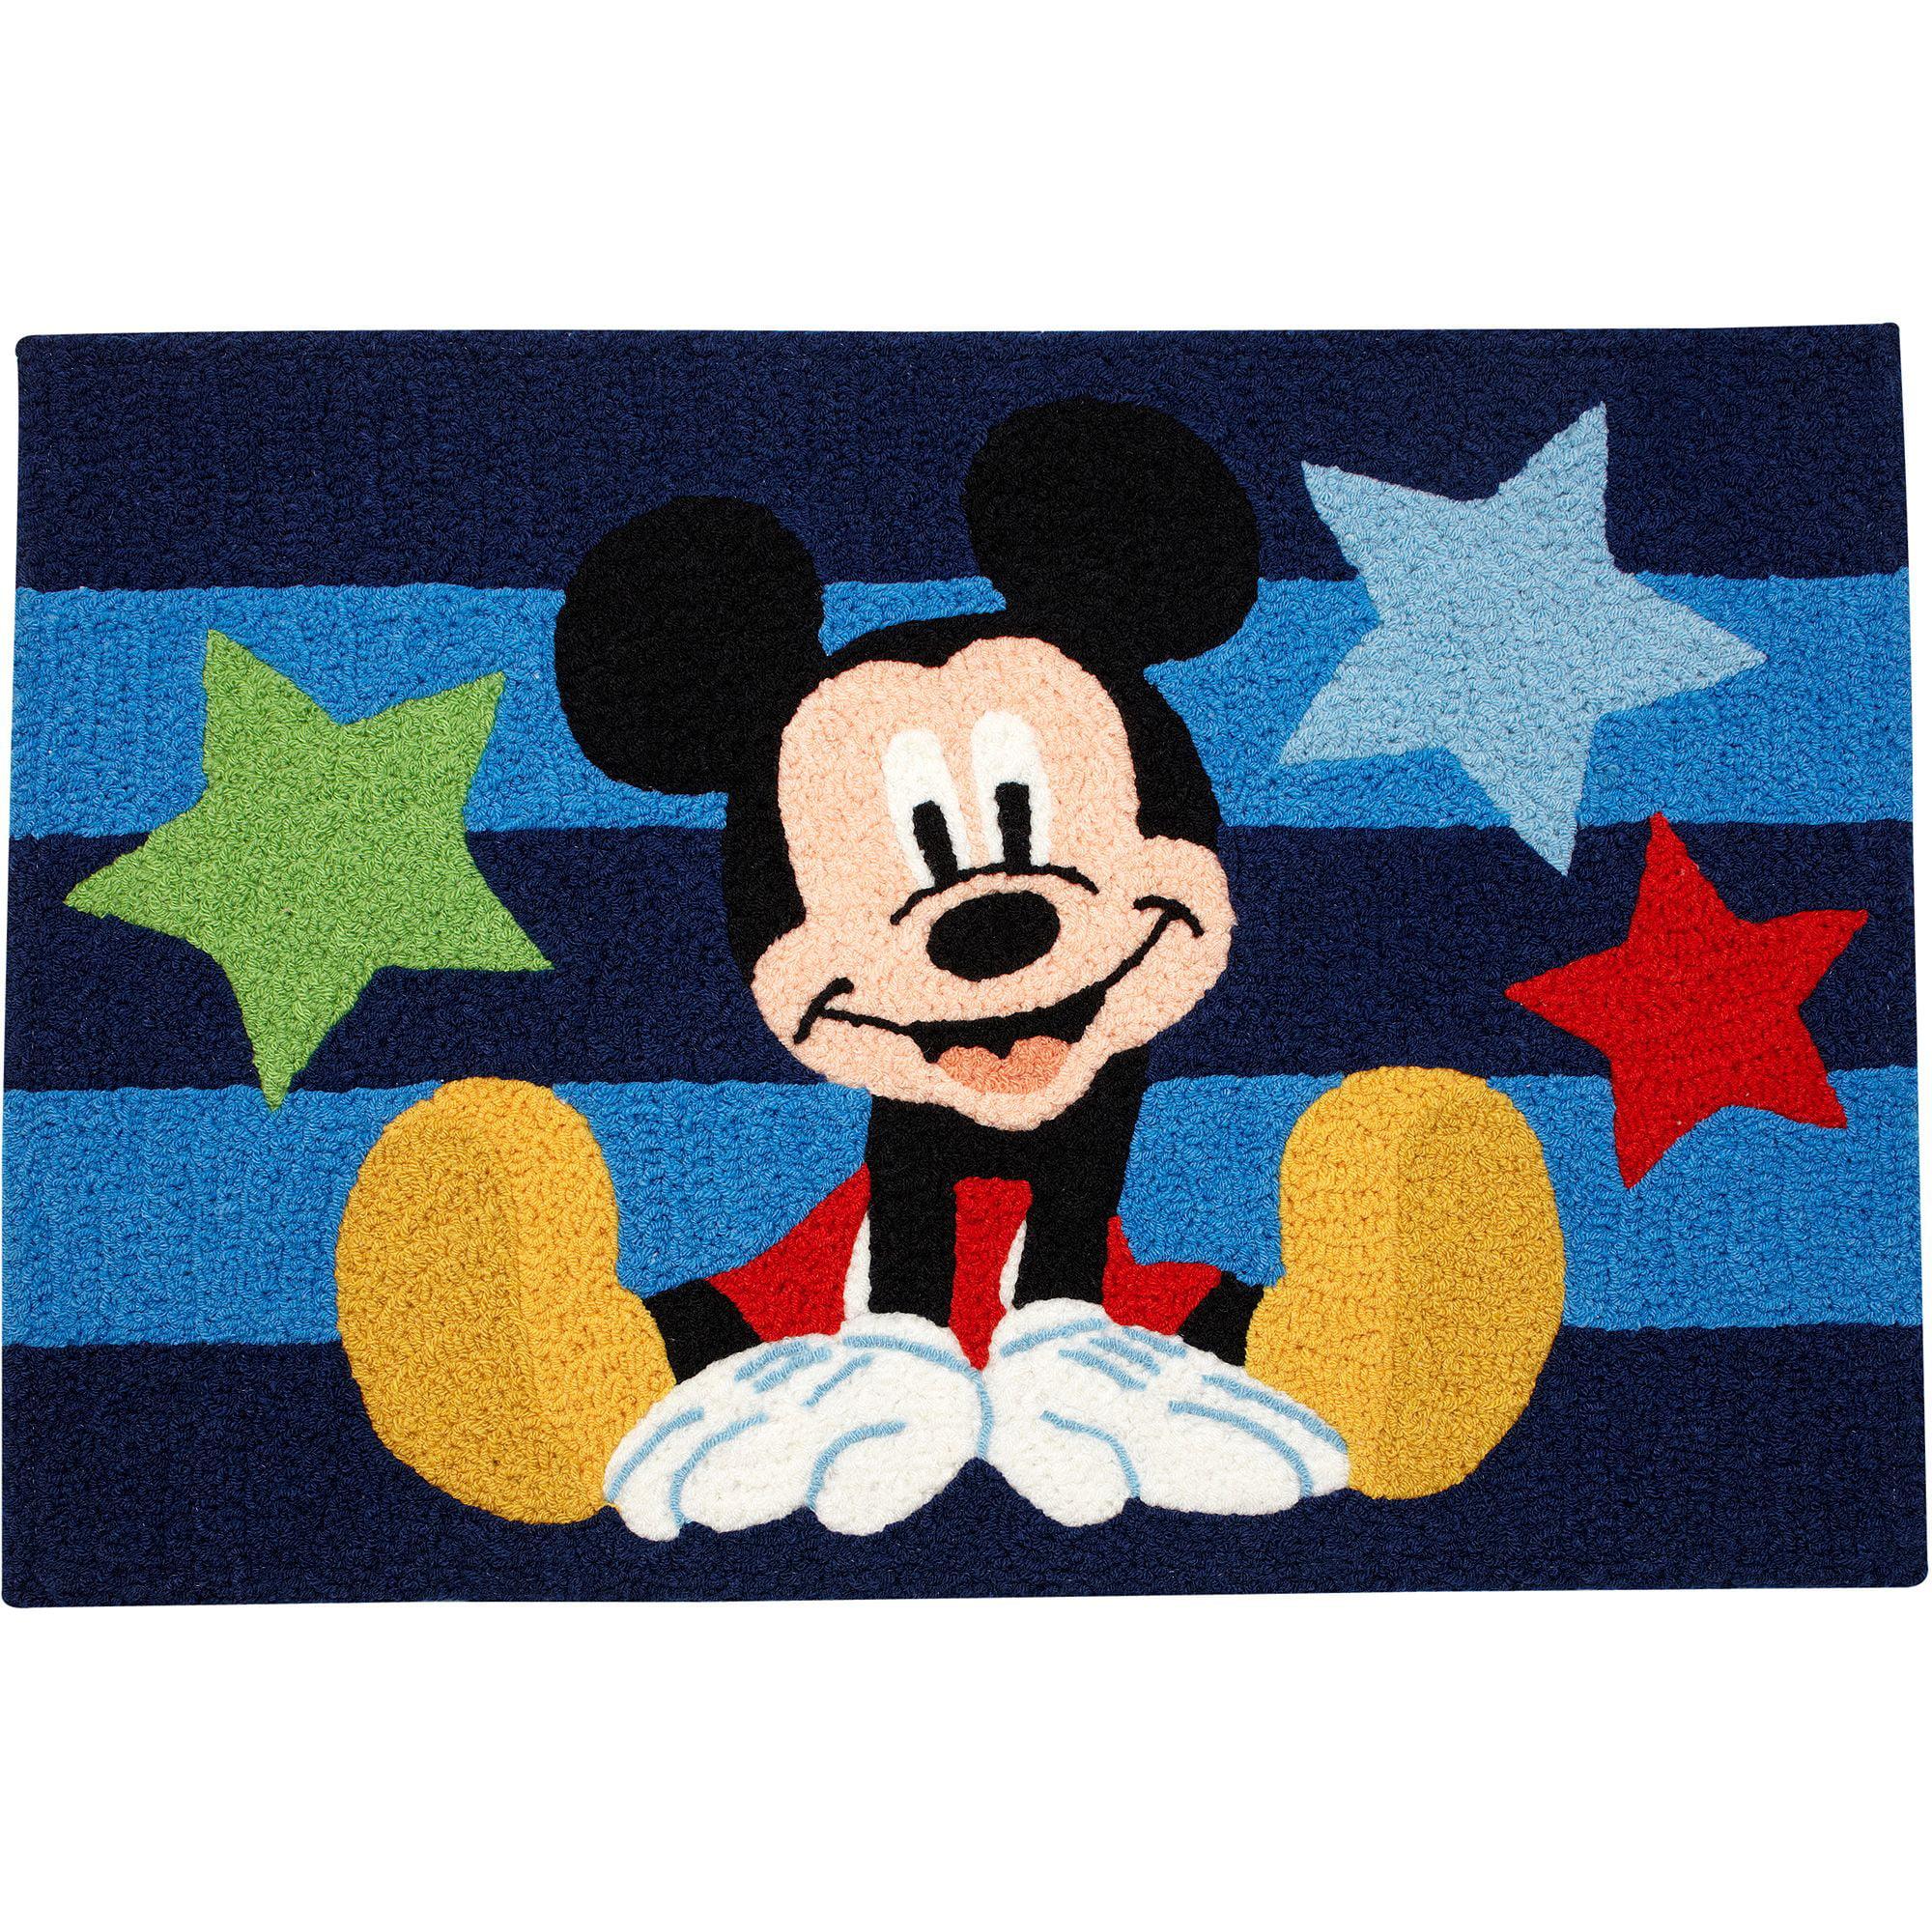 Disney Mickey Mouse Rug Walmart Com